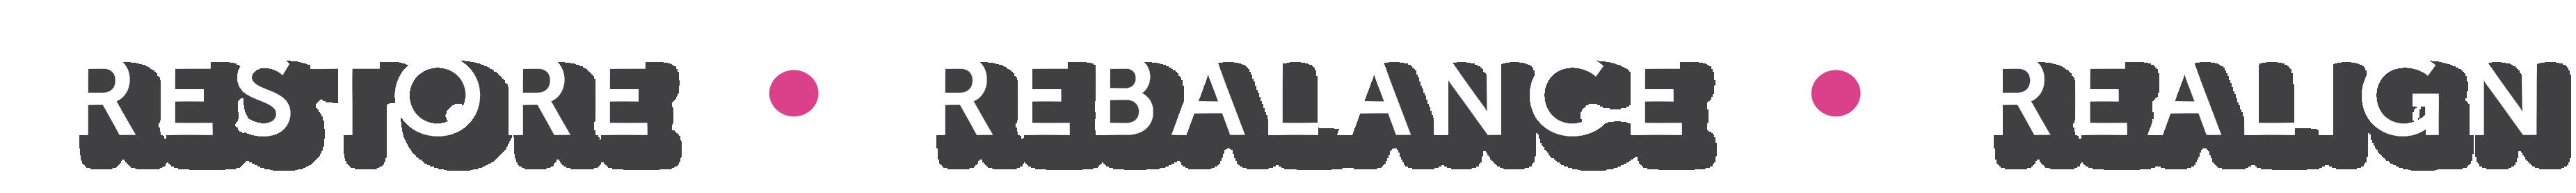 Restore Rebalance Realign tagline